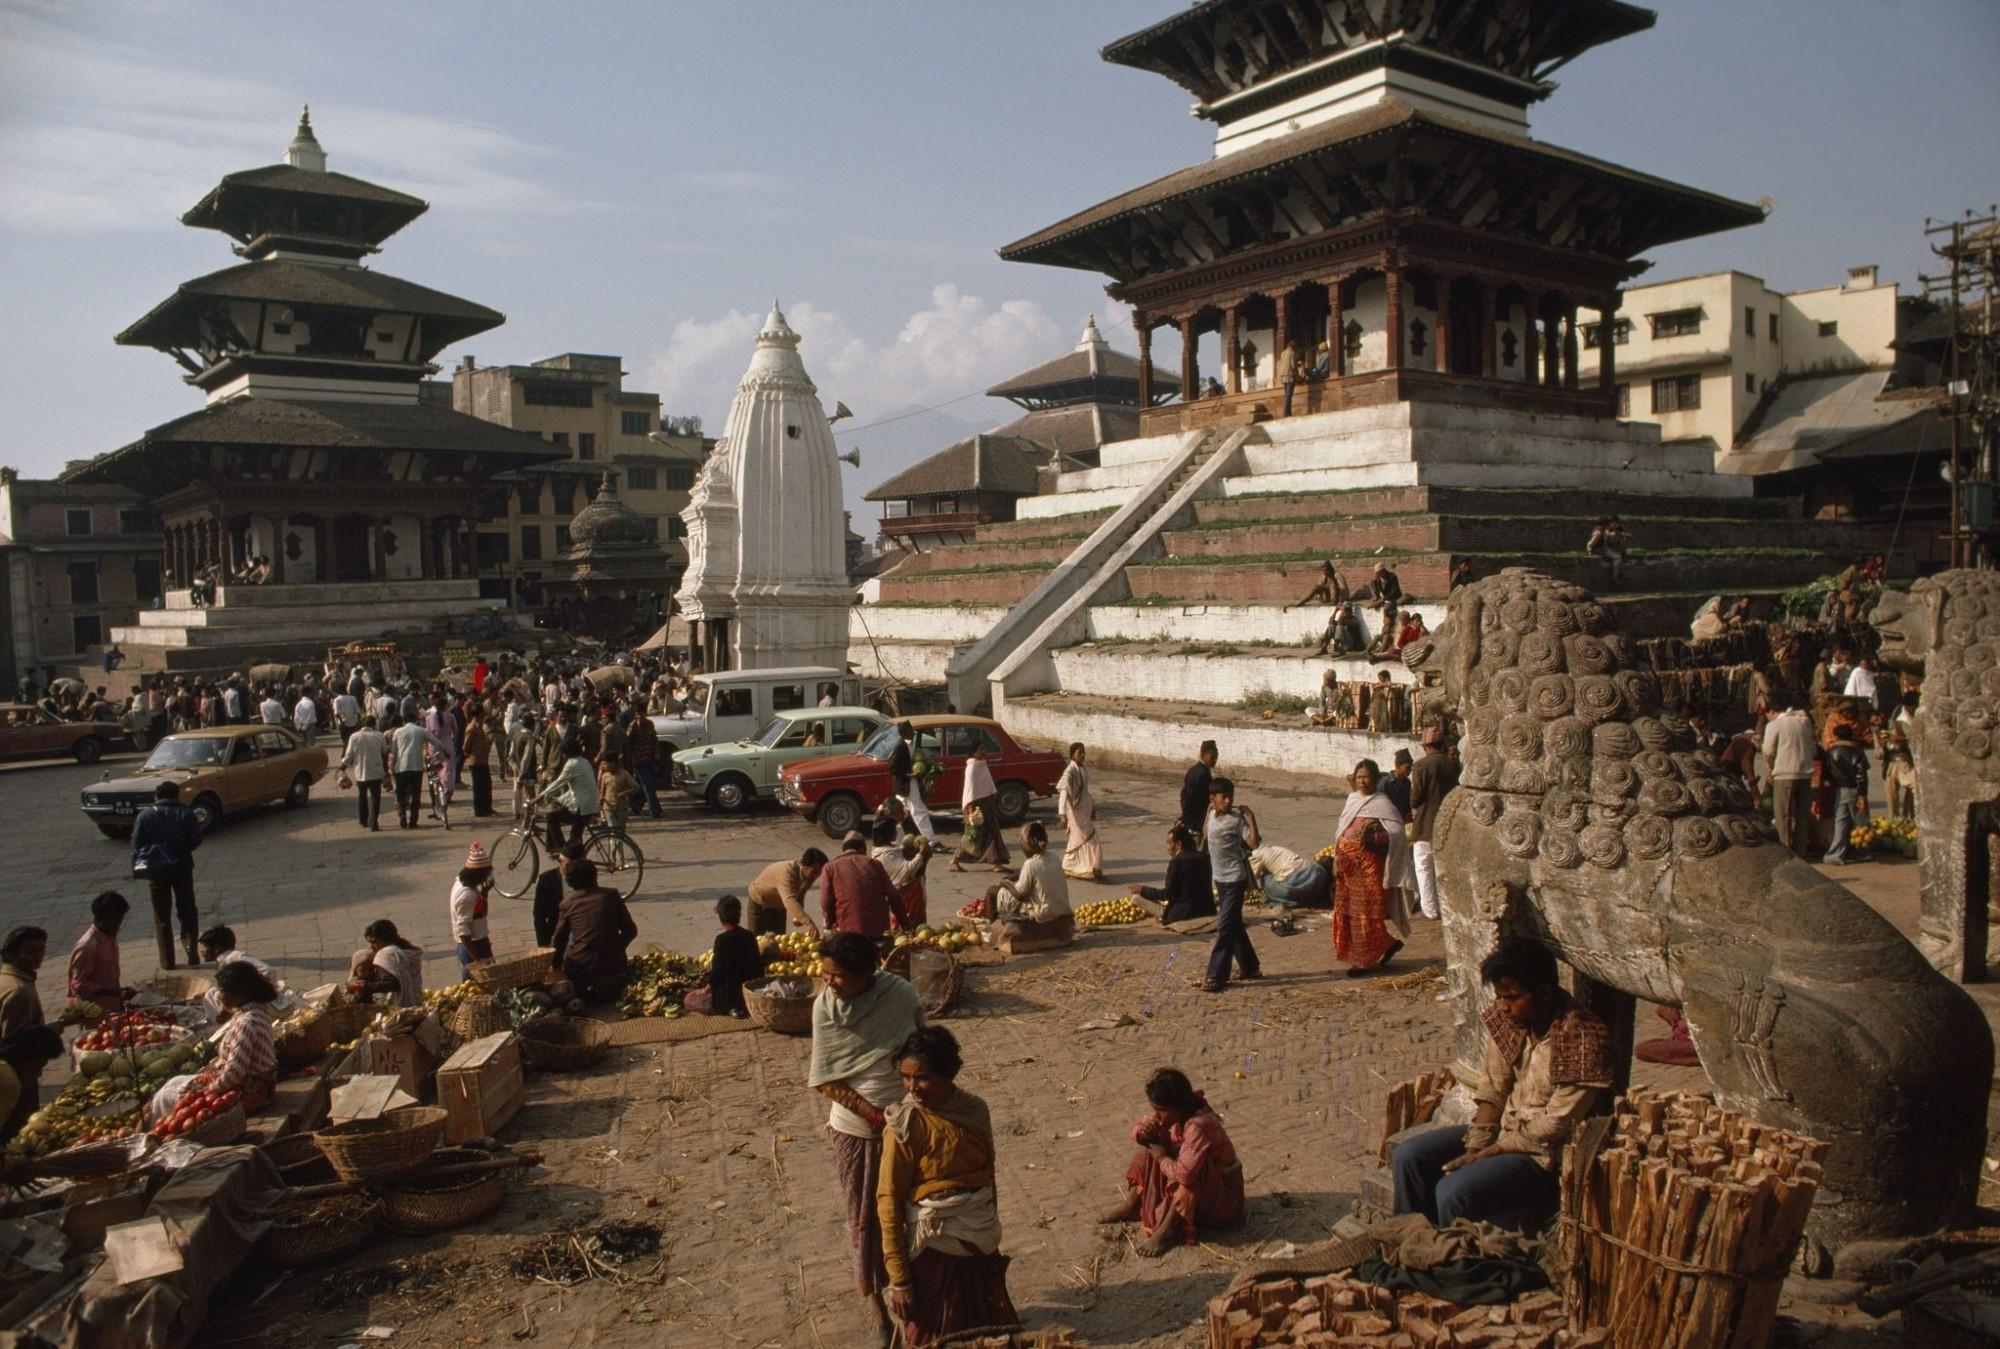 1979 Kathmandu Valley, Nepal (Photo by John Scofield